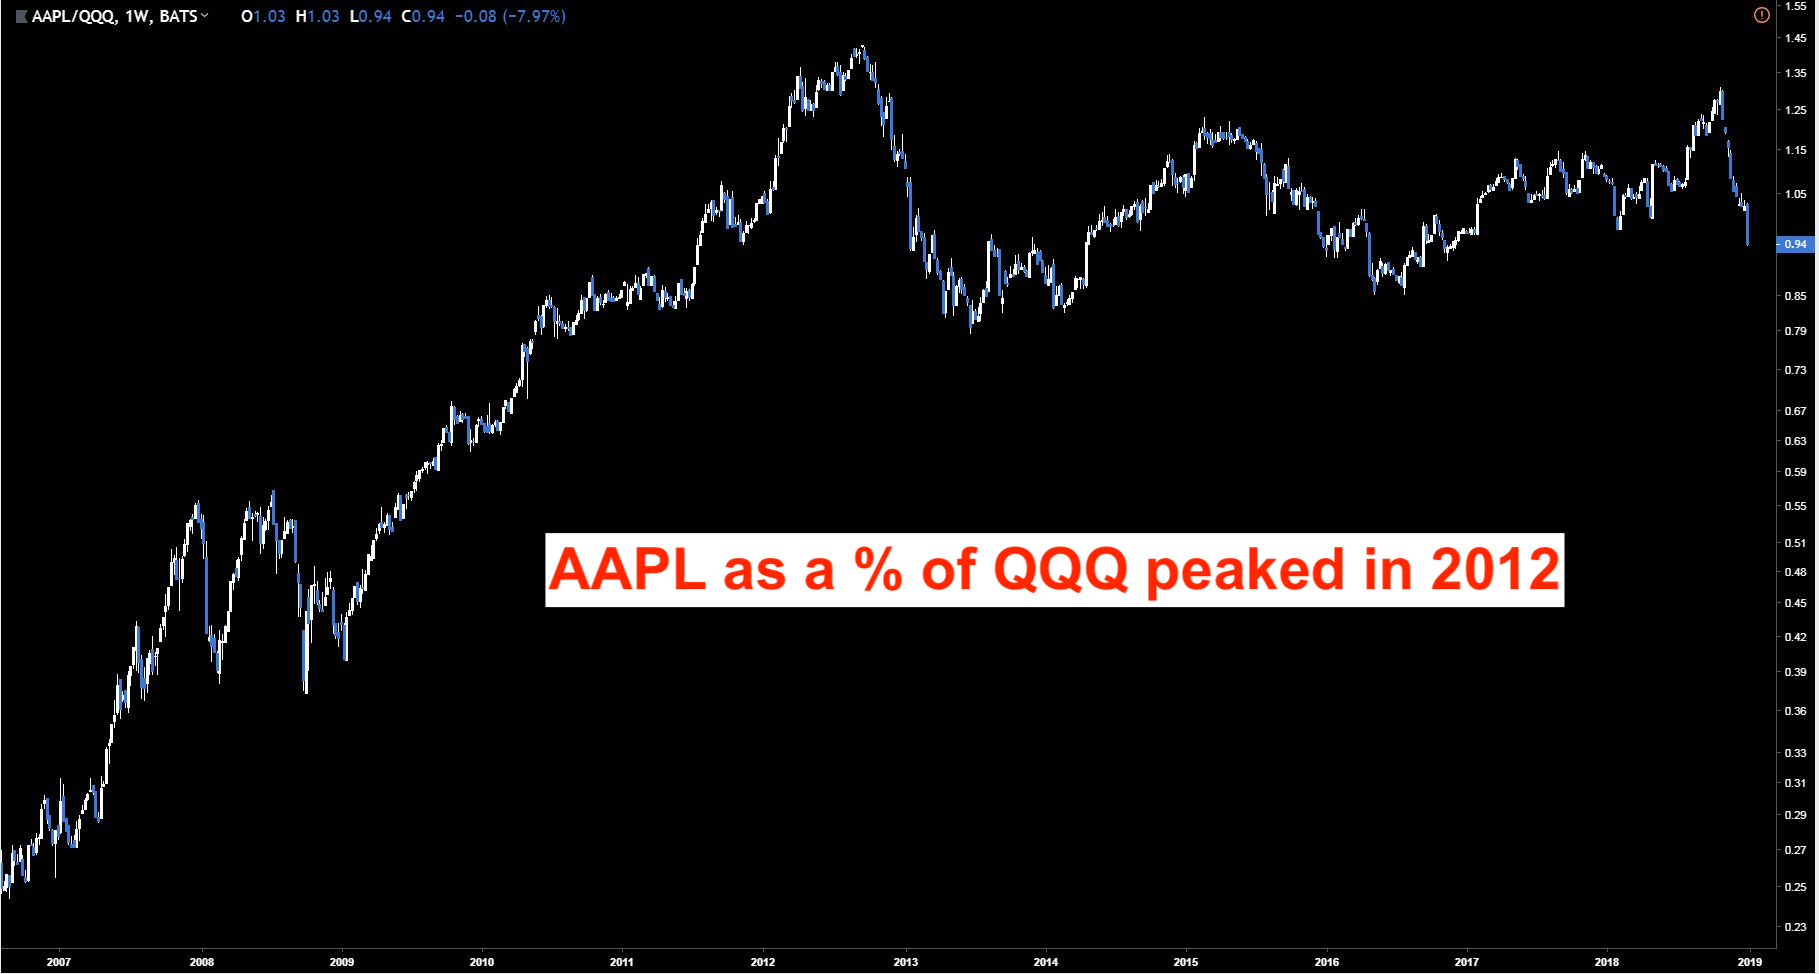 AAPL Stock Percent of QQQ